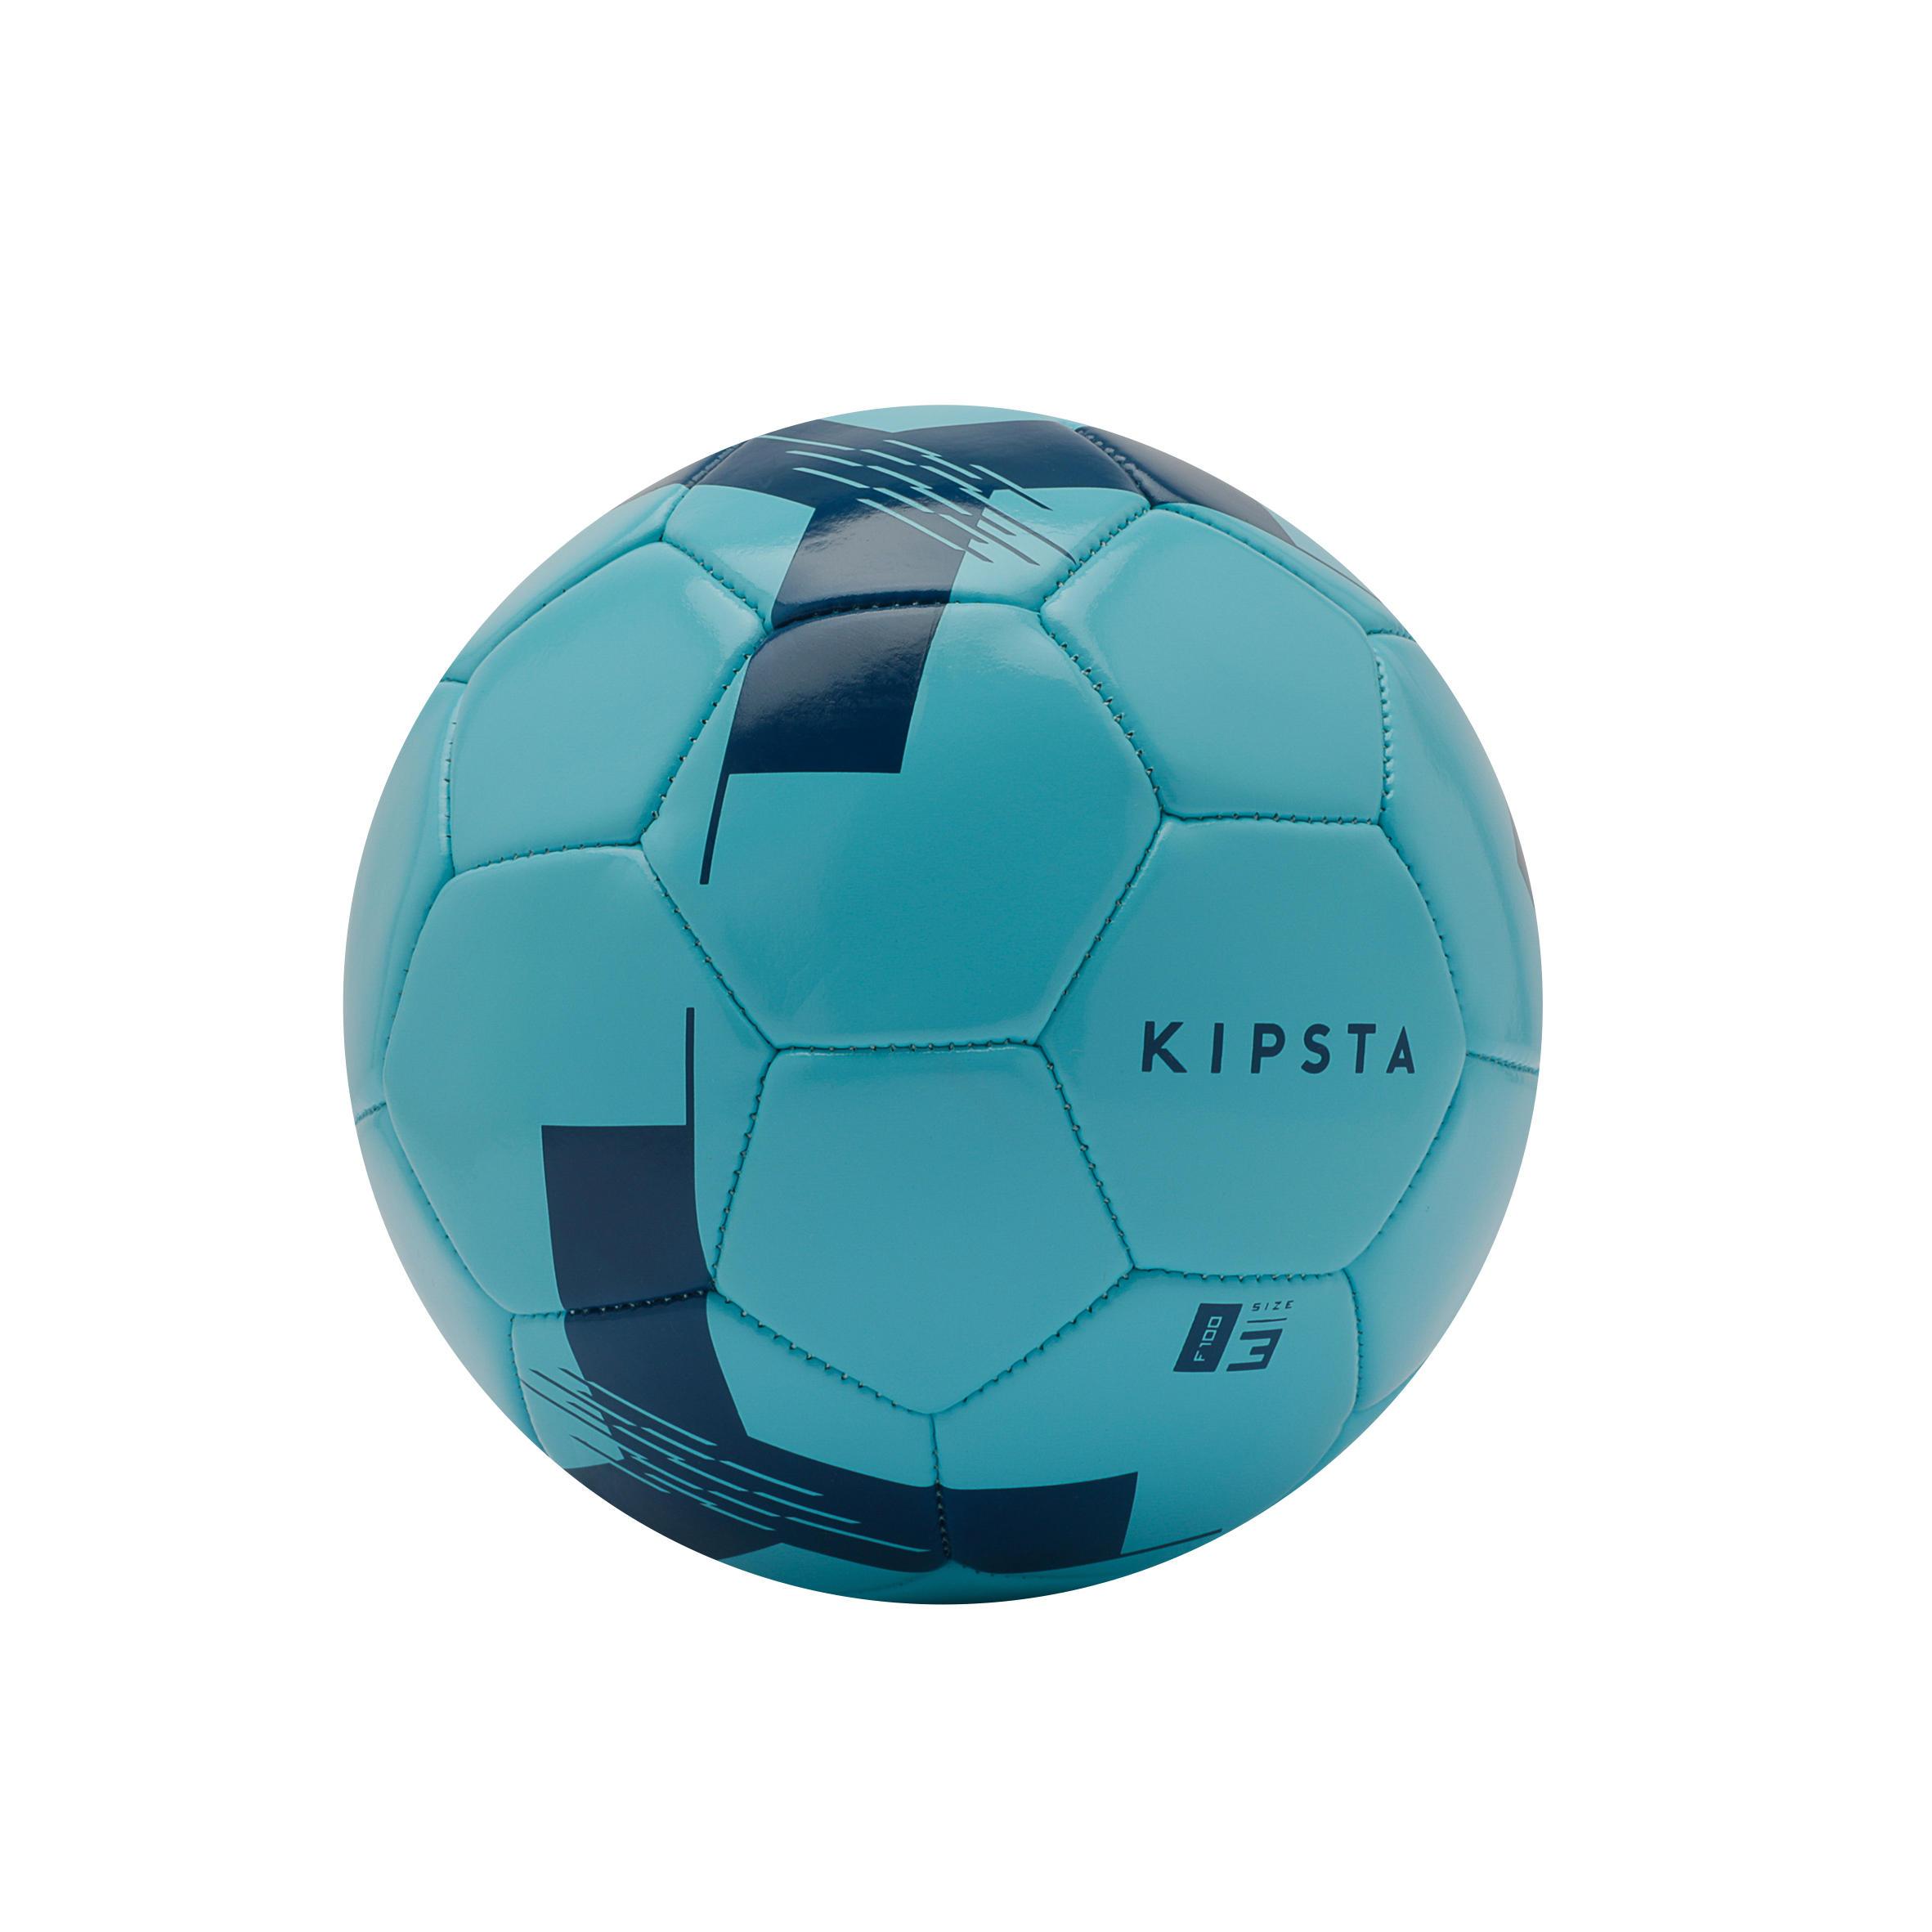 Minge Fotbal F100 M3 la Reducere poza